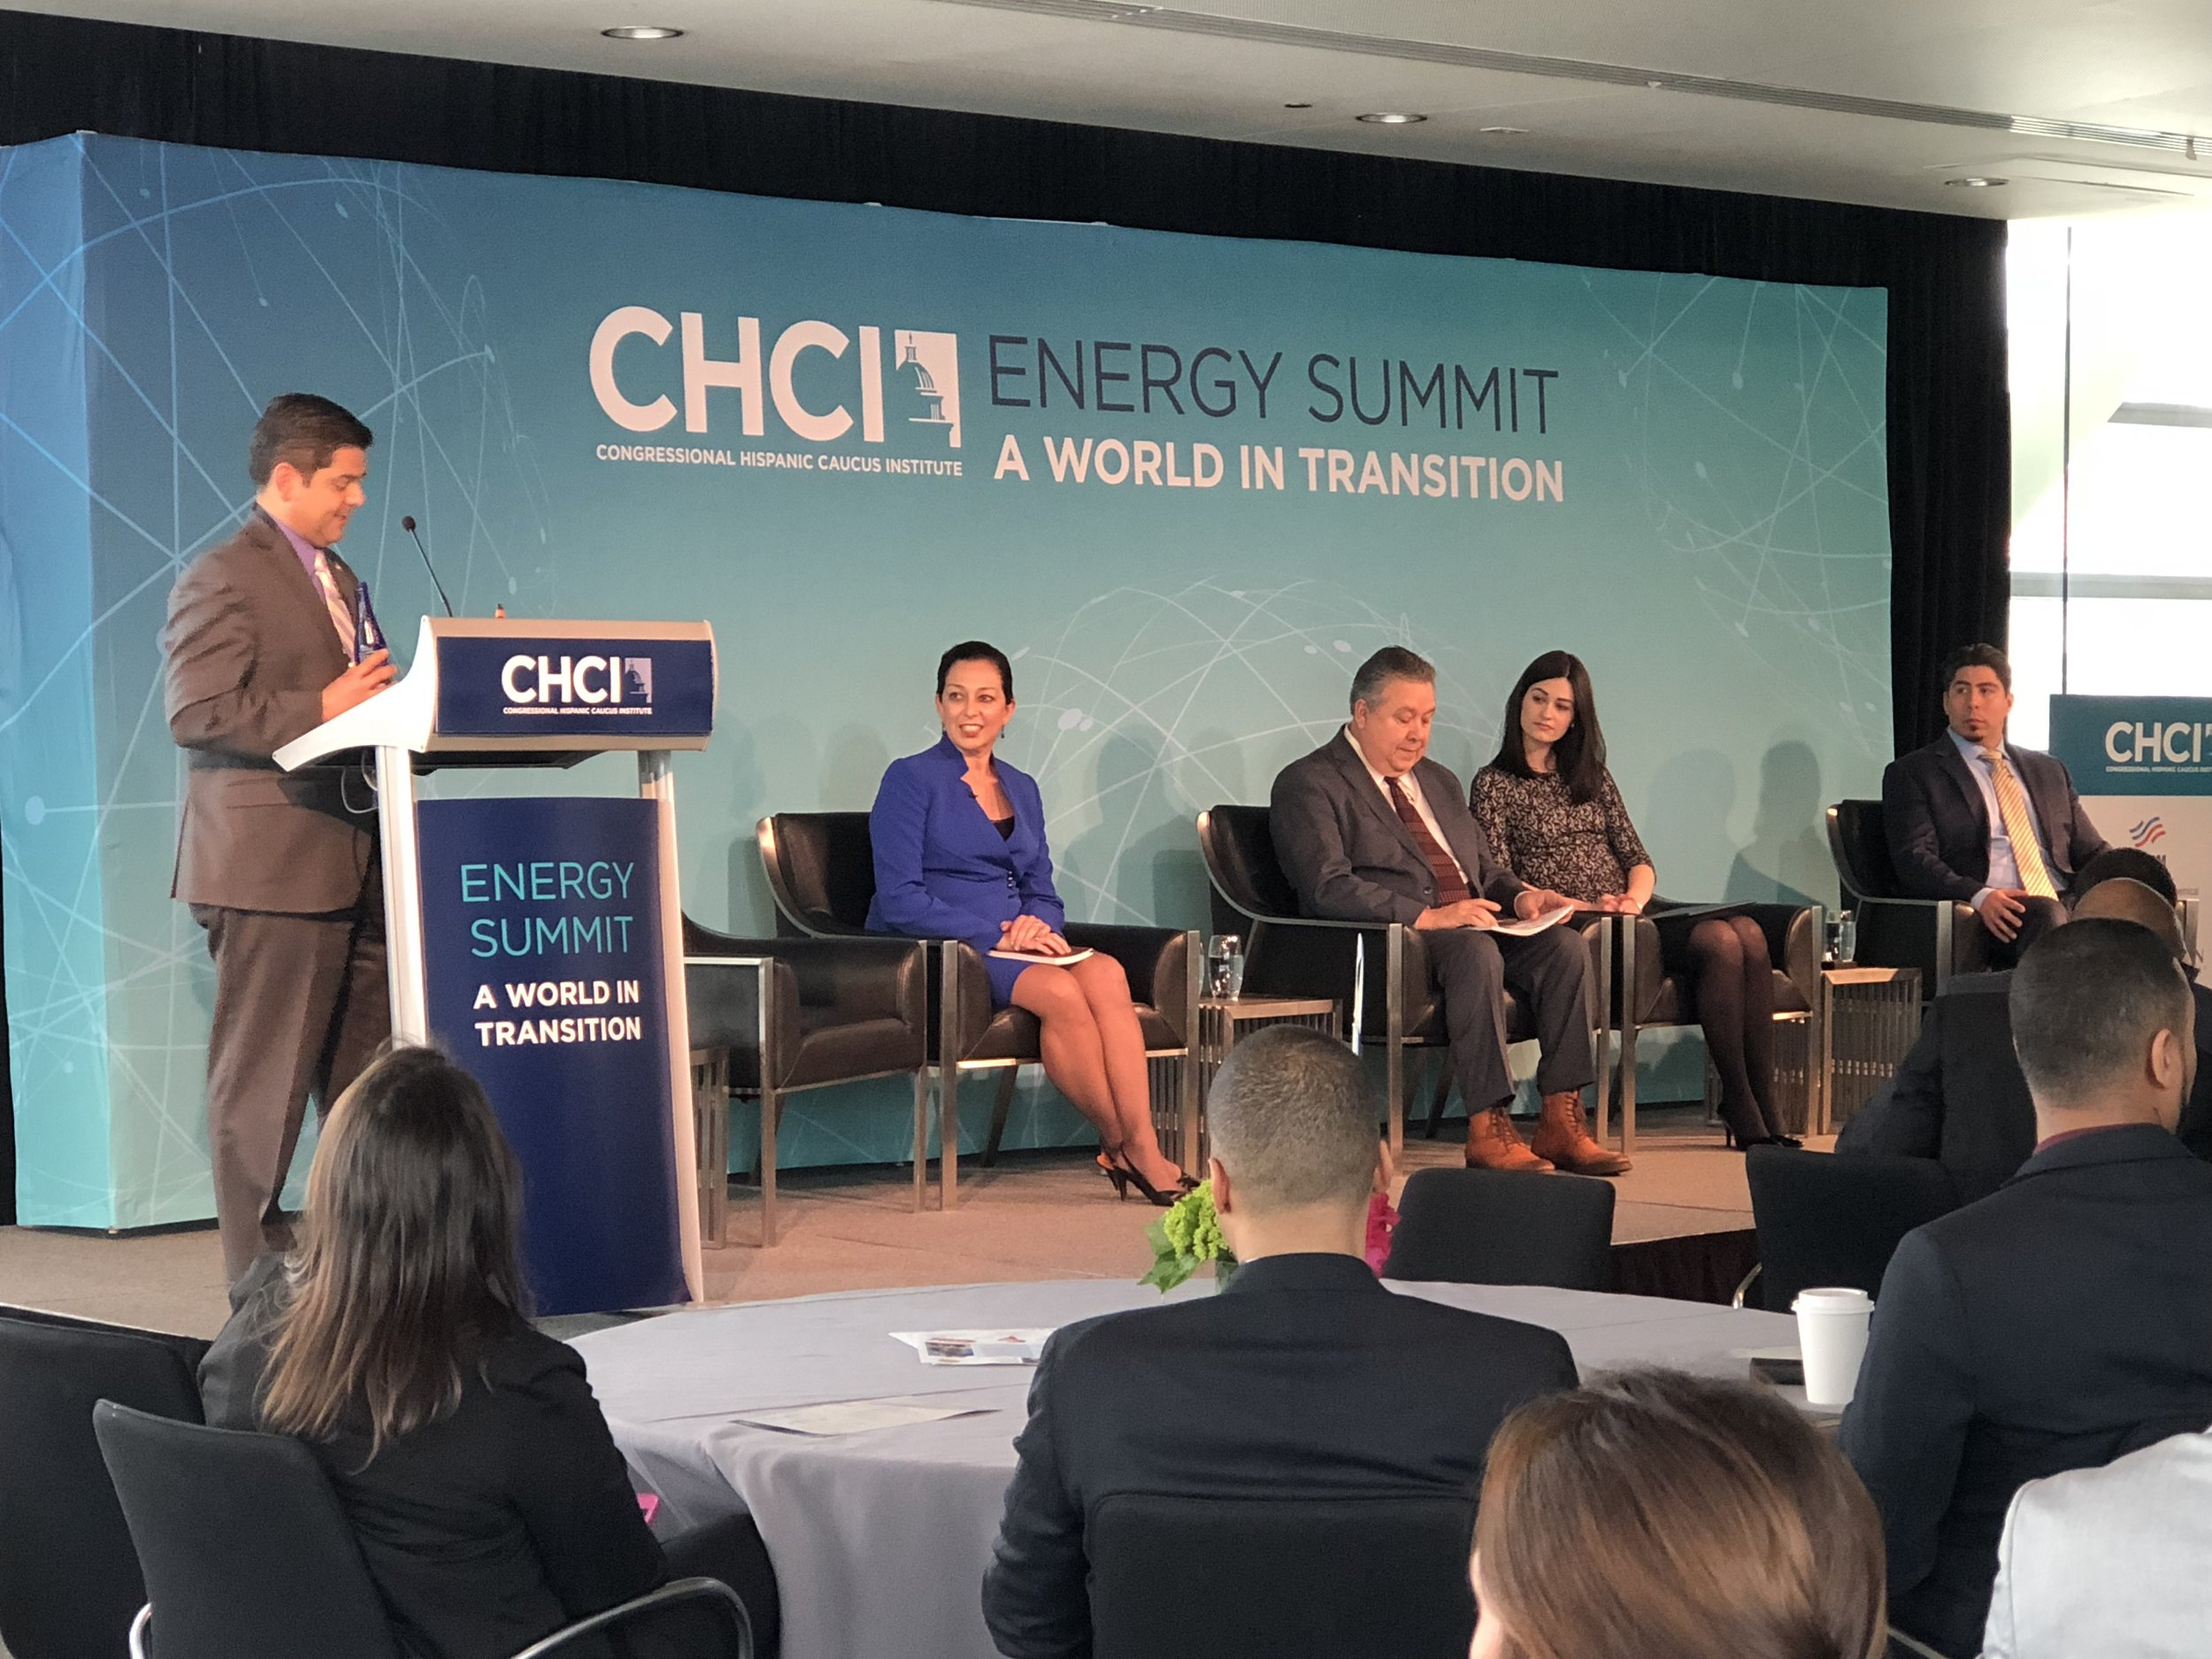 CHCI Energy Summit Stage Backdrop & Podium